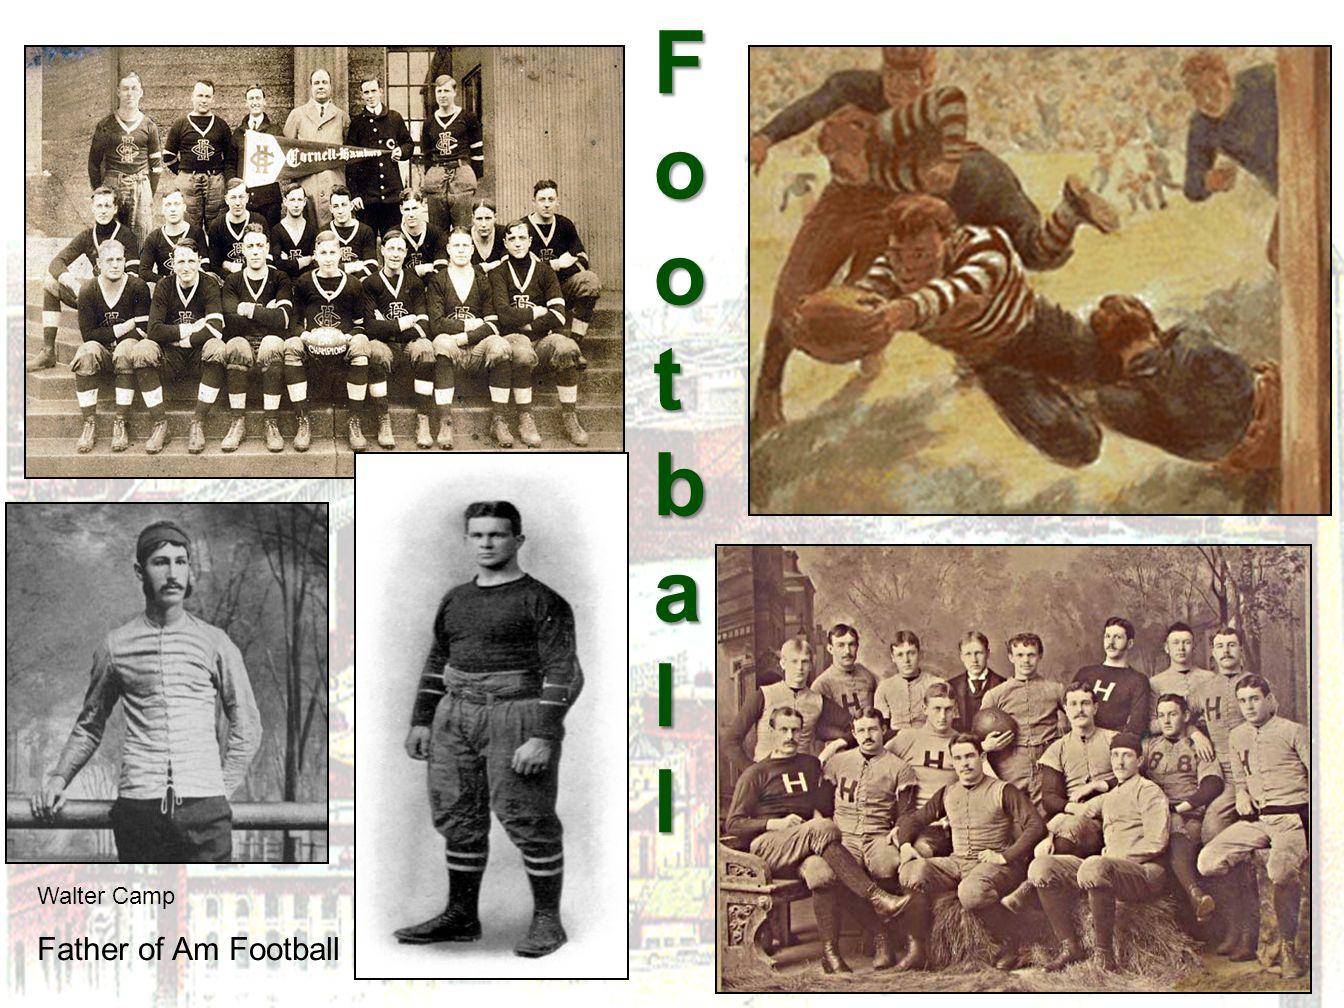 FootballFootballFootballFootball Walter Camp Father of Am Football